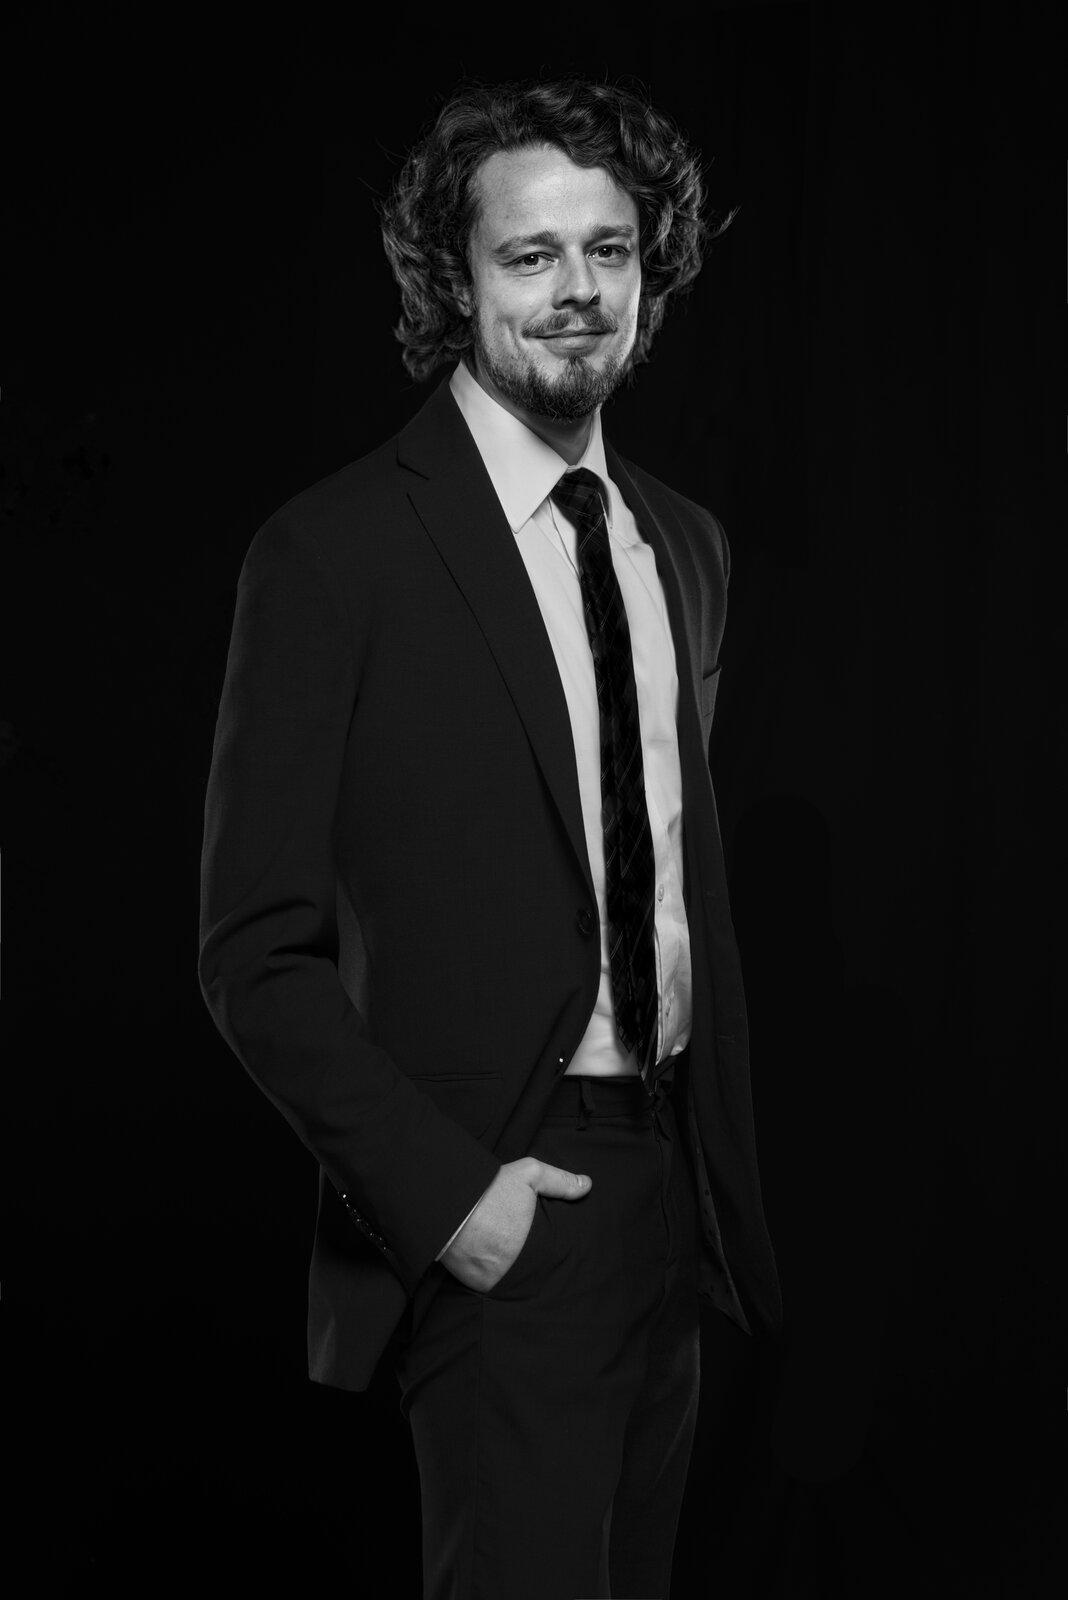 Paweł Stefaniuk